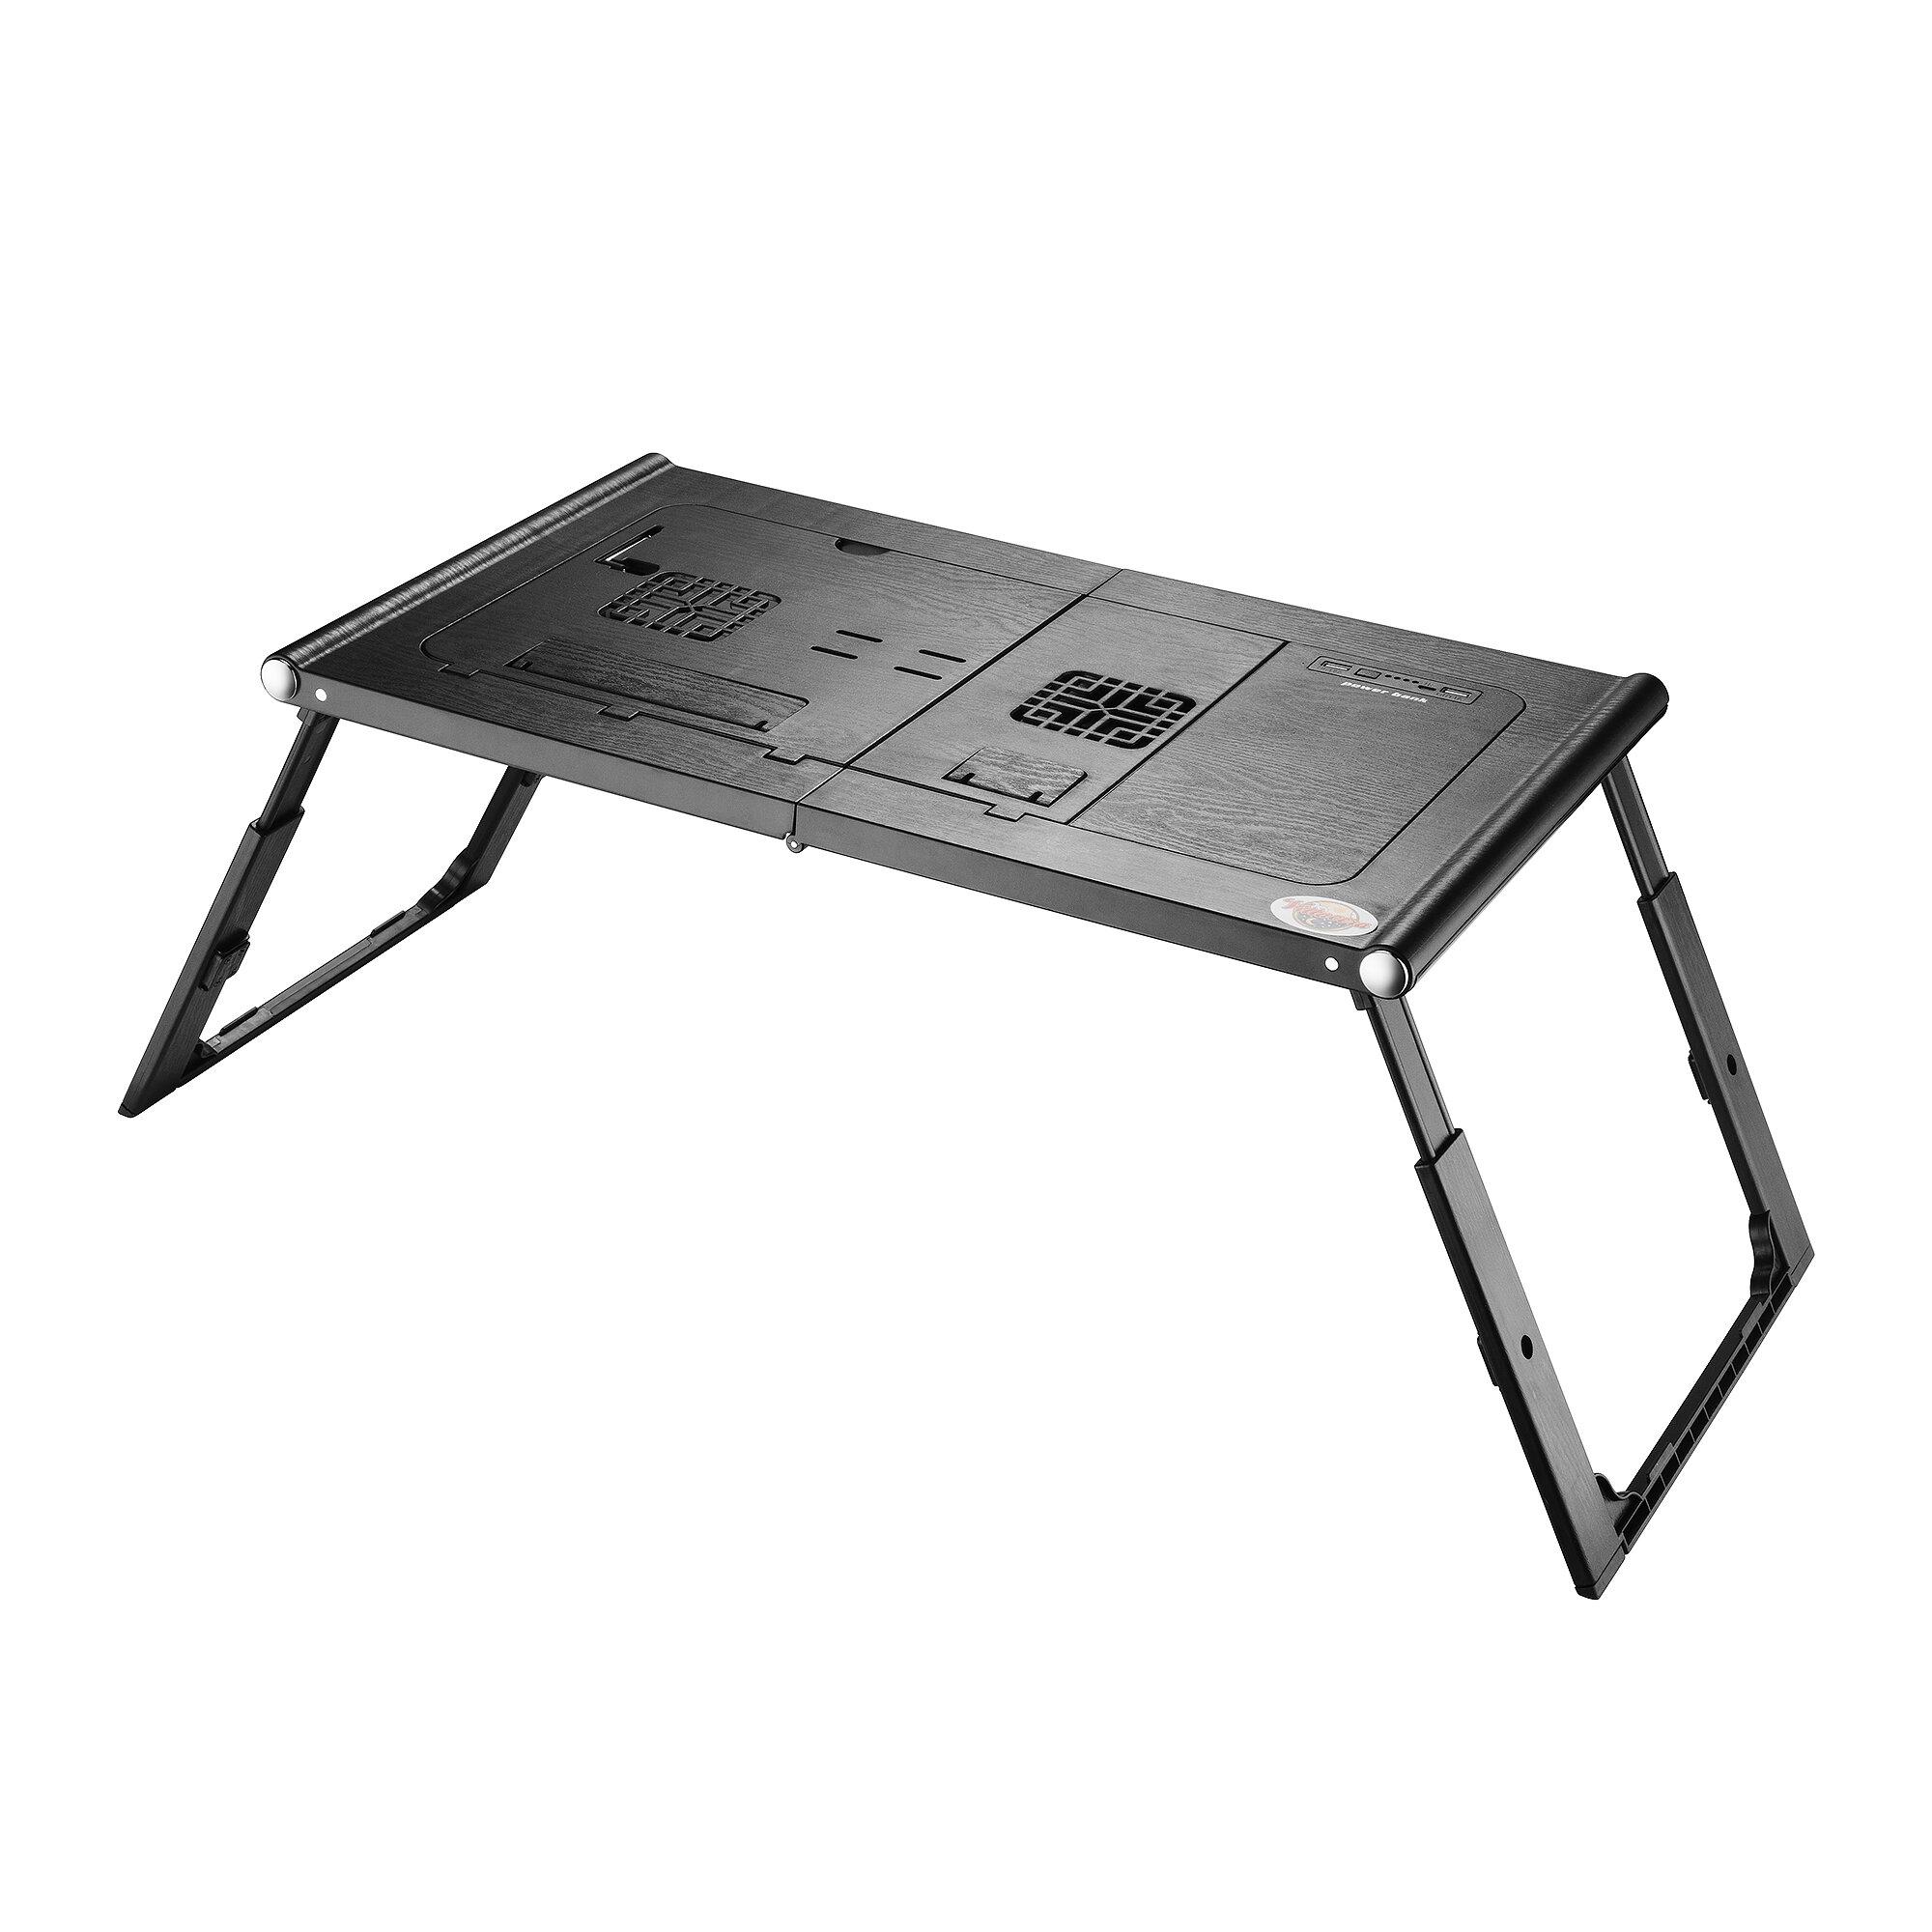 Exceptionnel Symple Stuff Kaminski Smart Adjustable USB Hub Laptop Tray | Wayfair